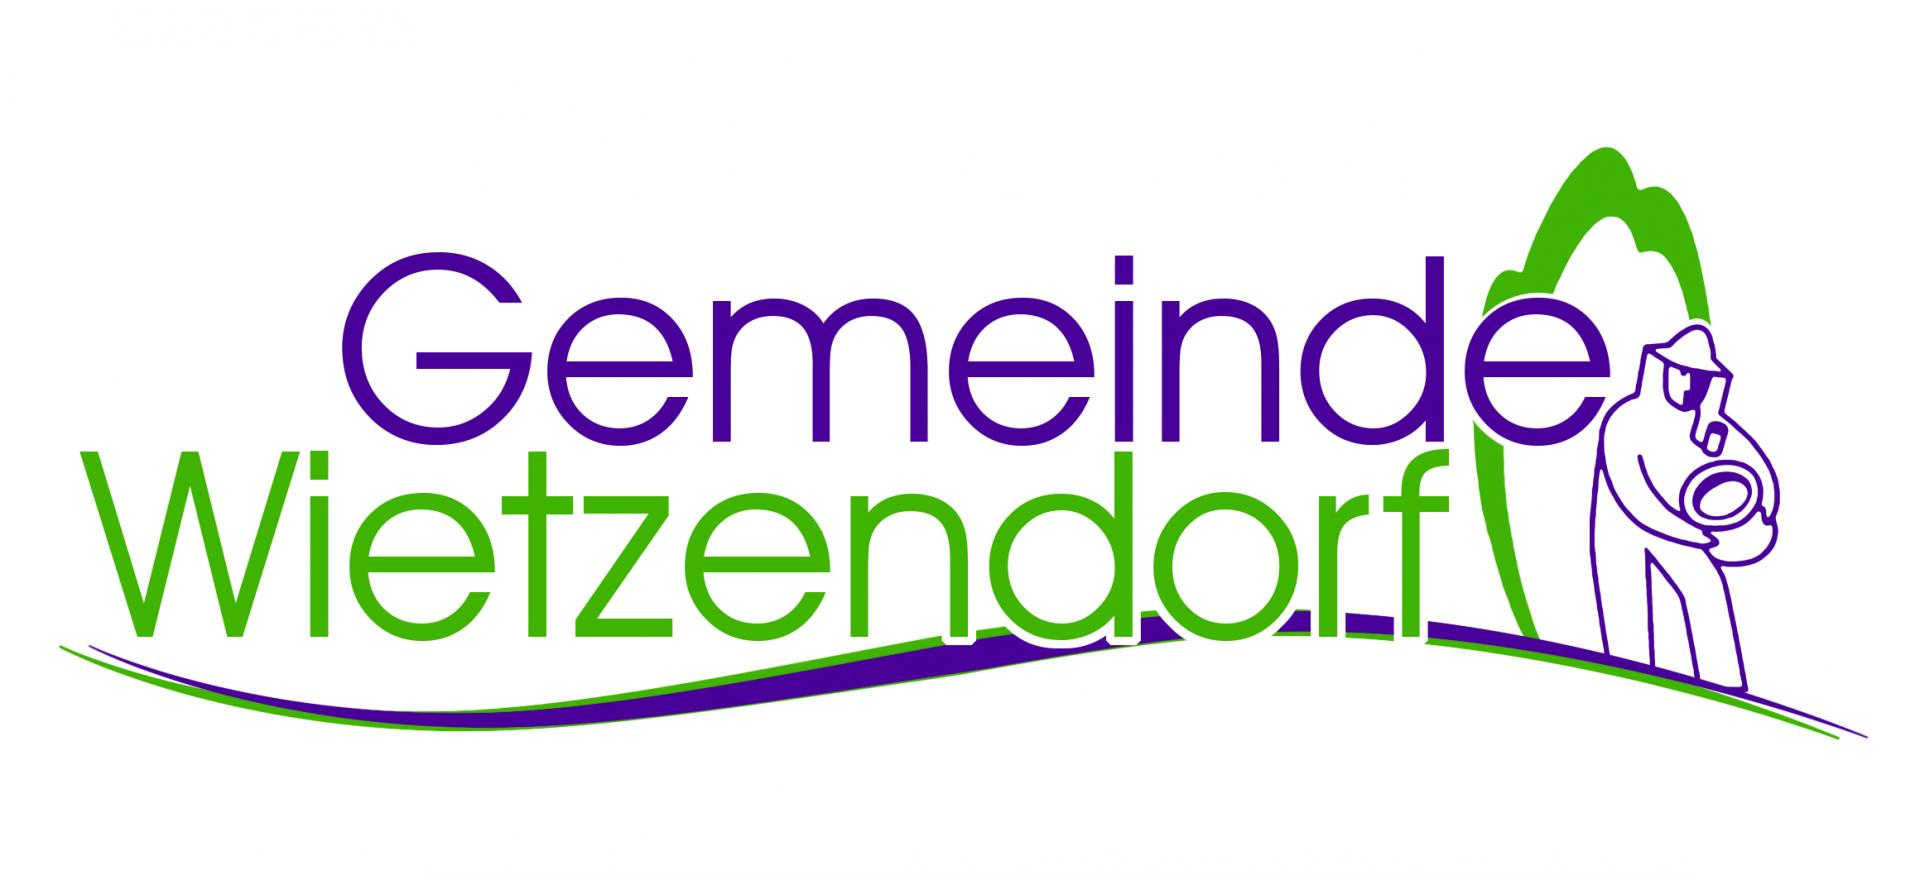 Wietzendorf Logo